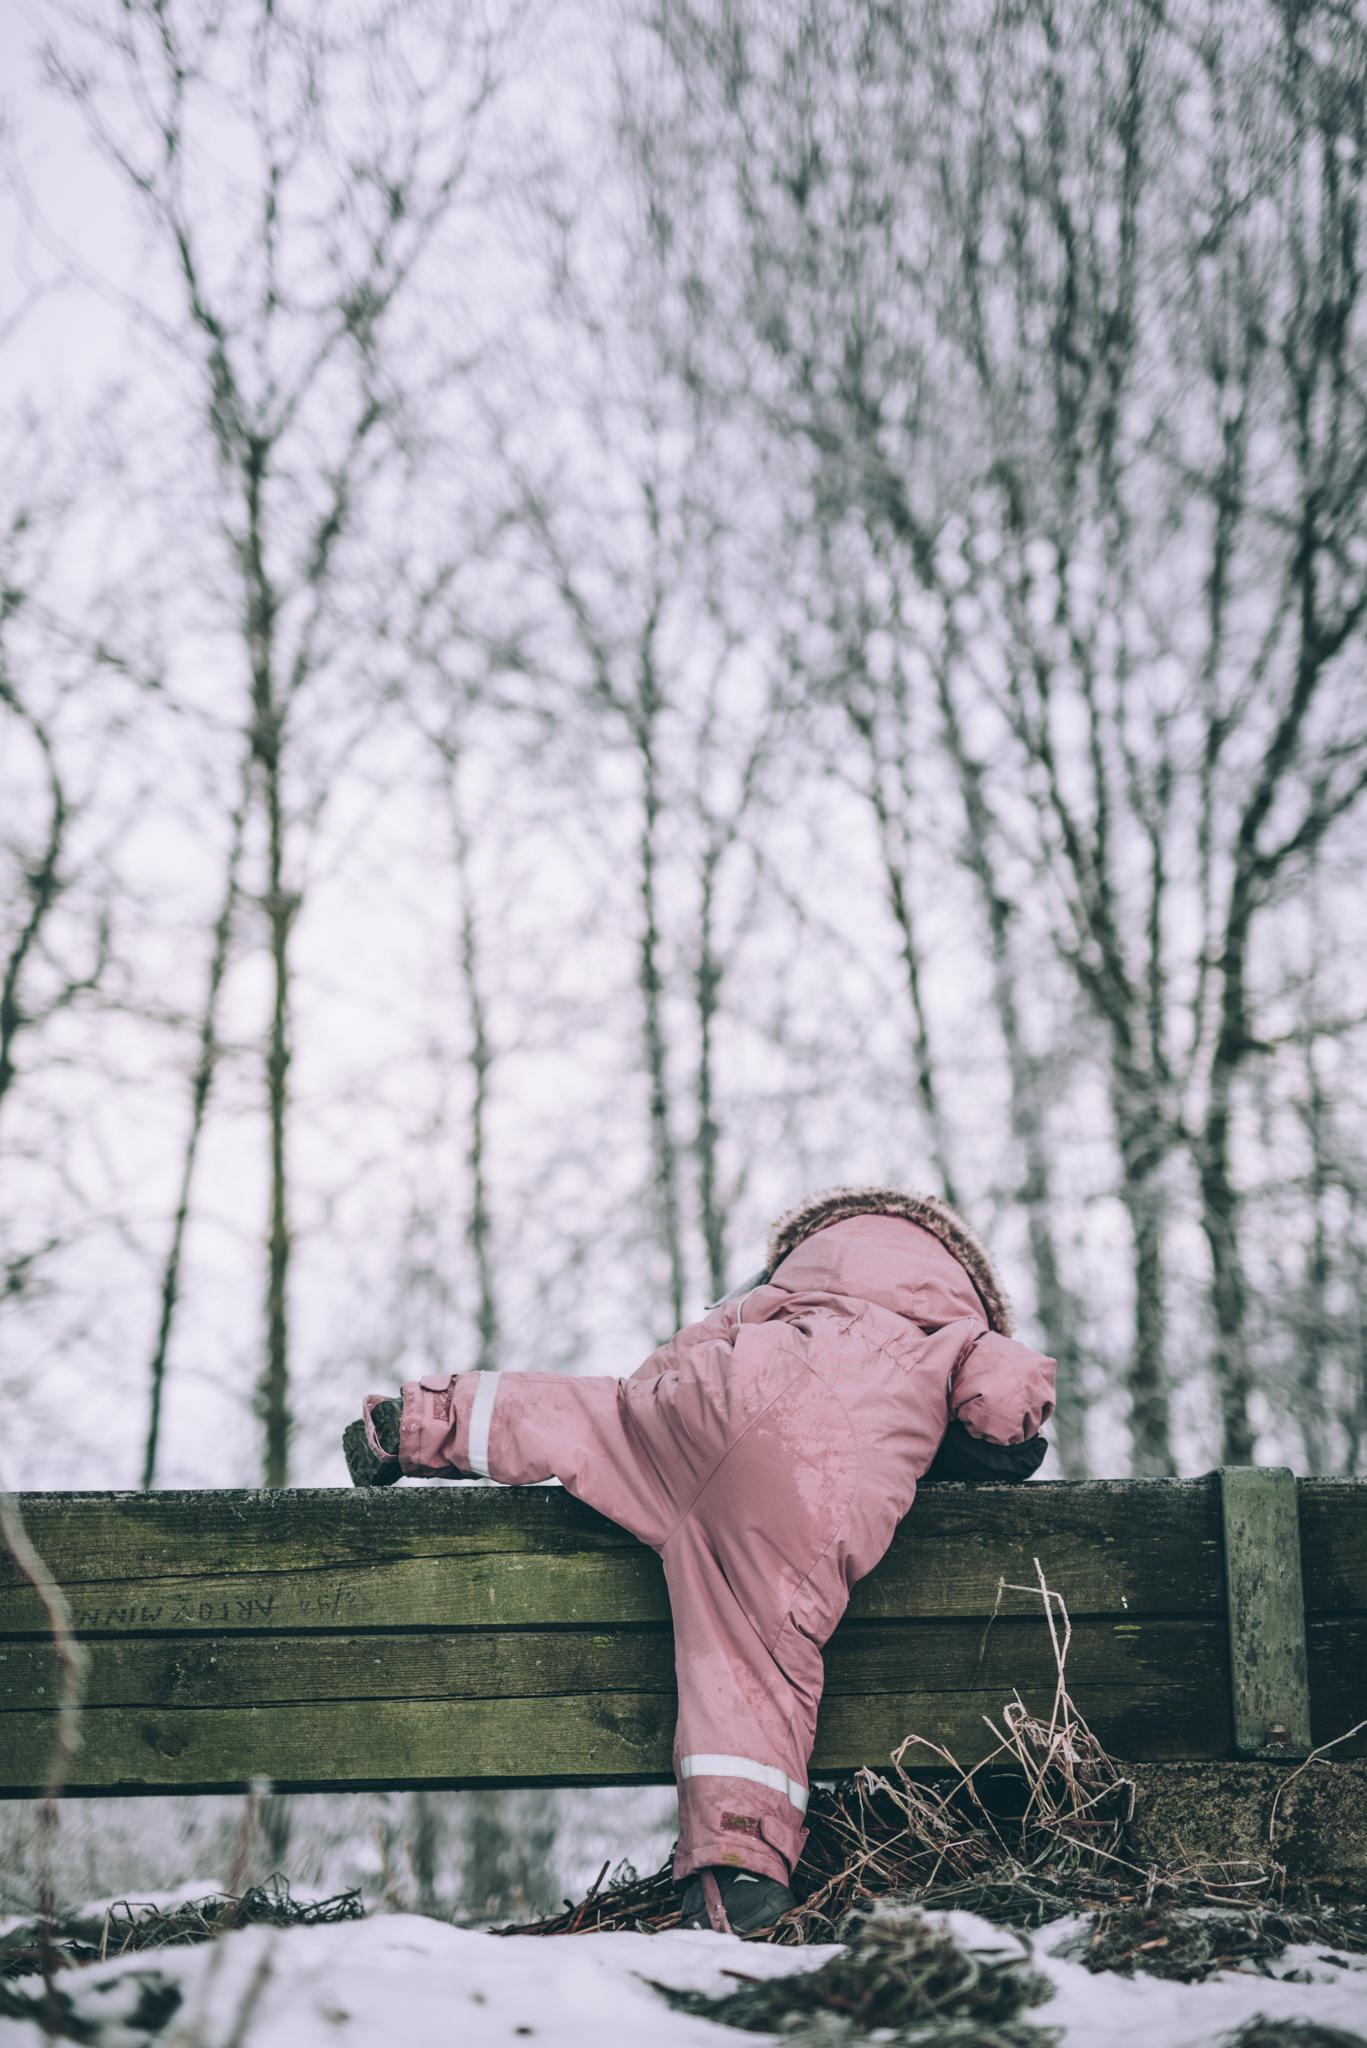 Child climbing a beam